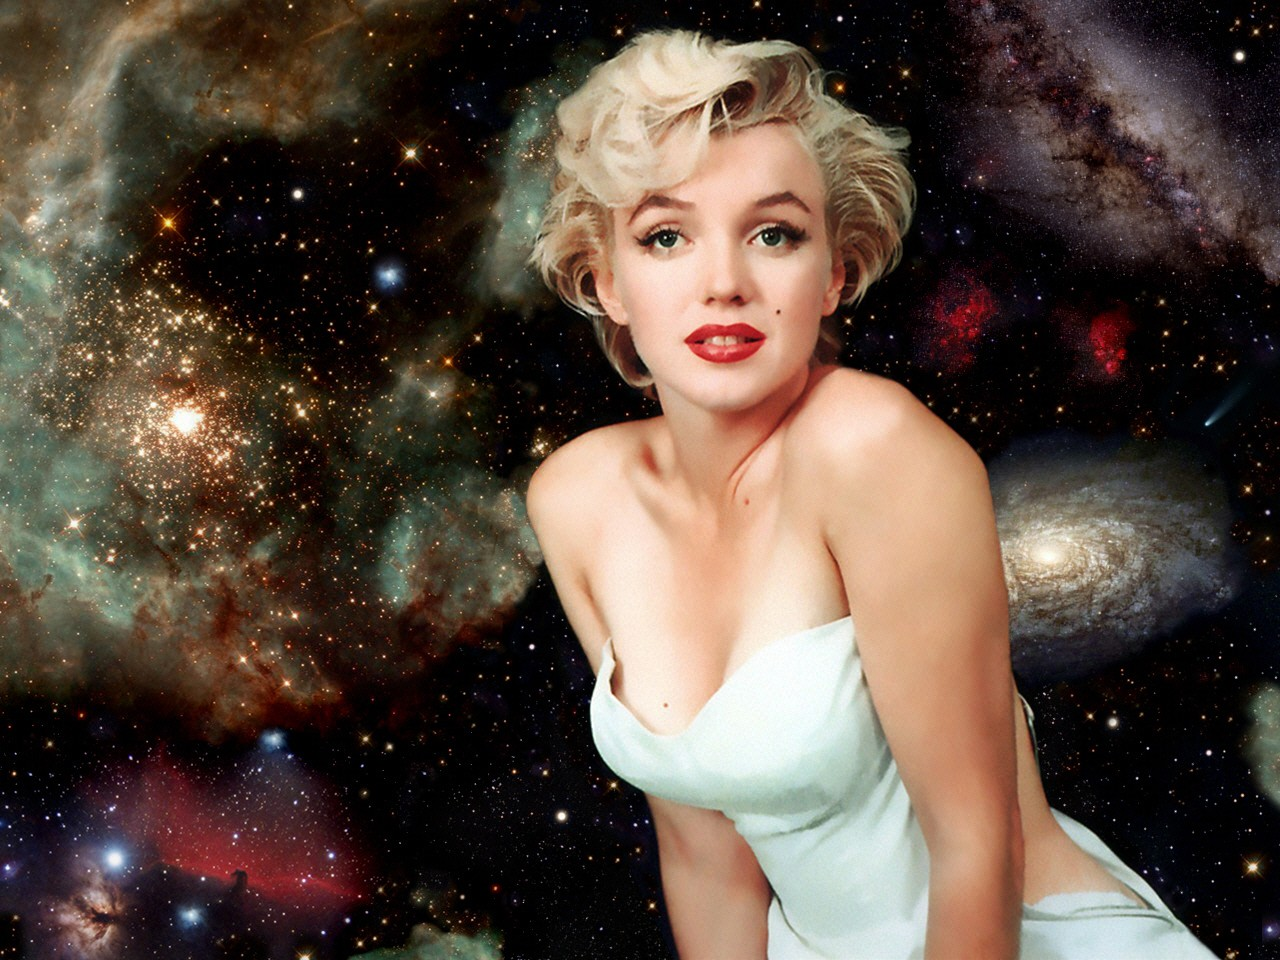 Cute Marilyn Monroe HD PicturesPhotos ImagesHigh Quality 1280x960